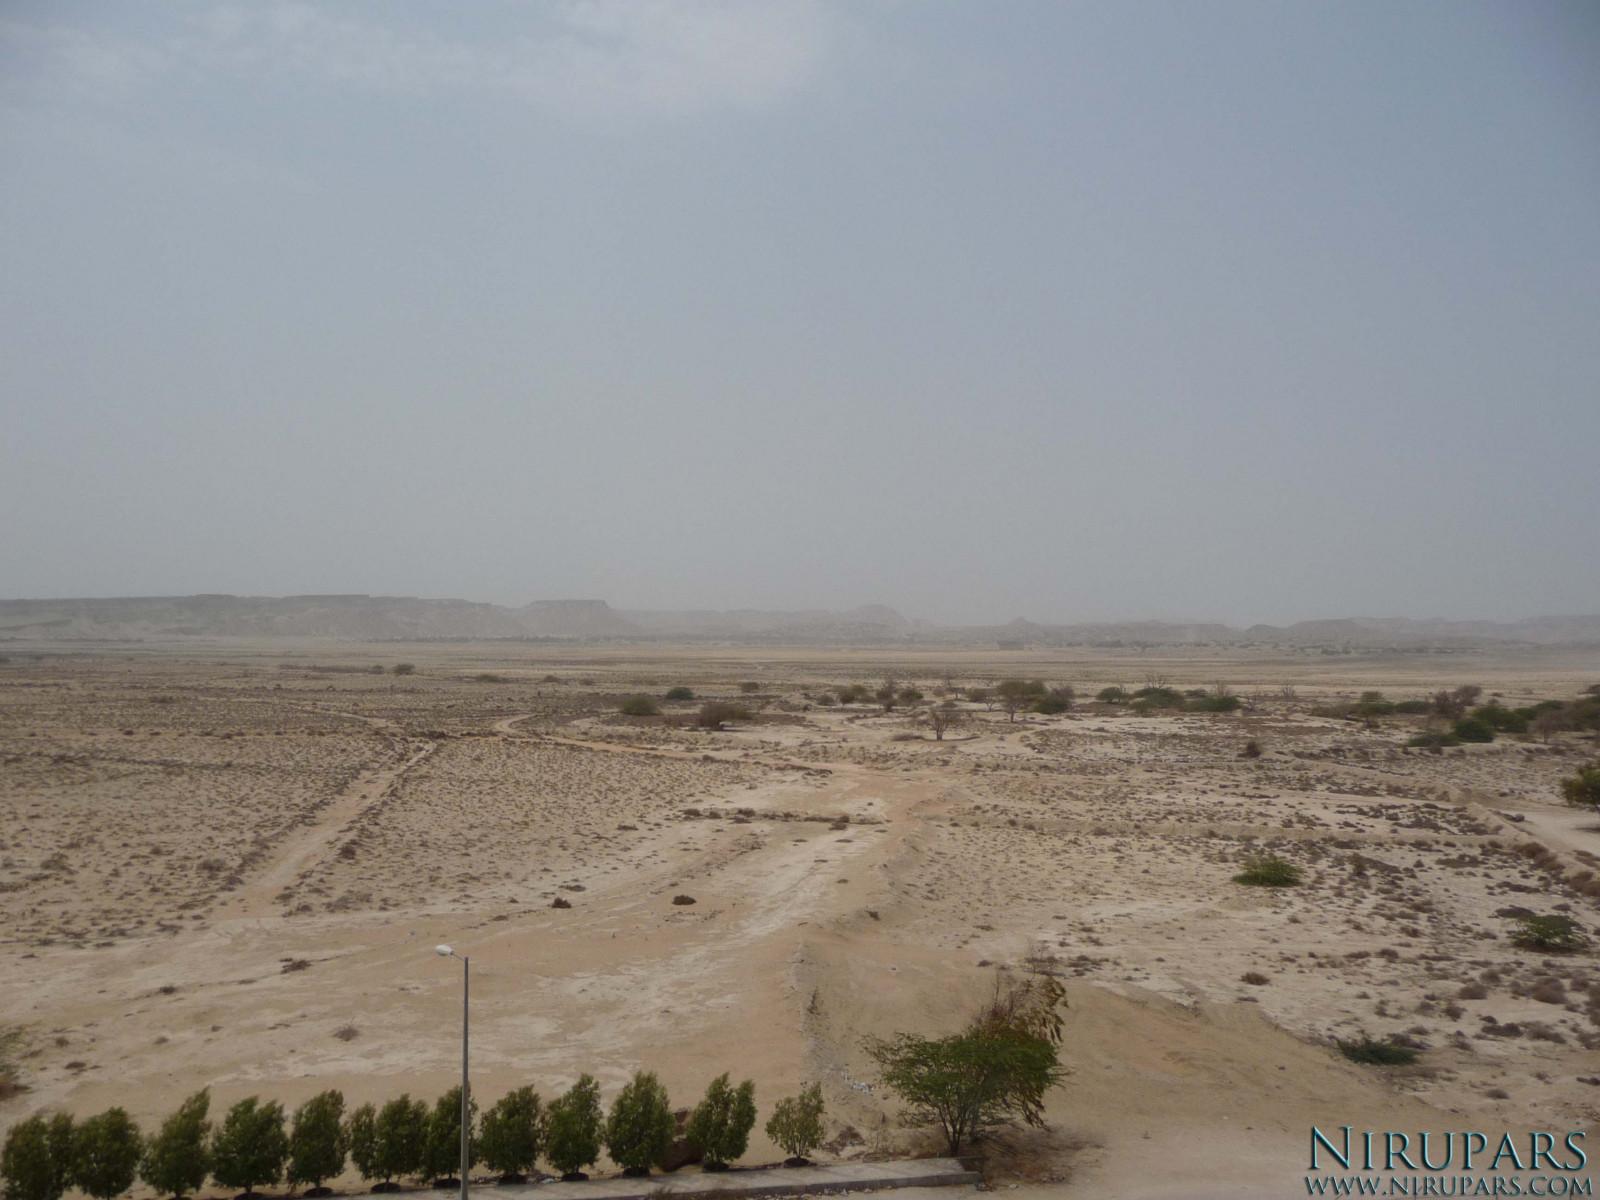 Qeshm Island - Landscape